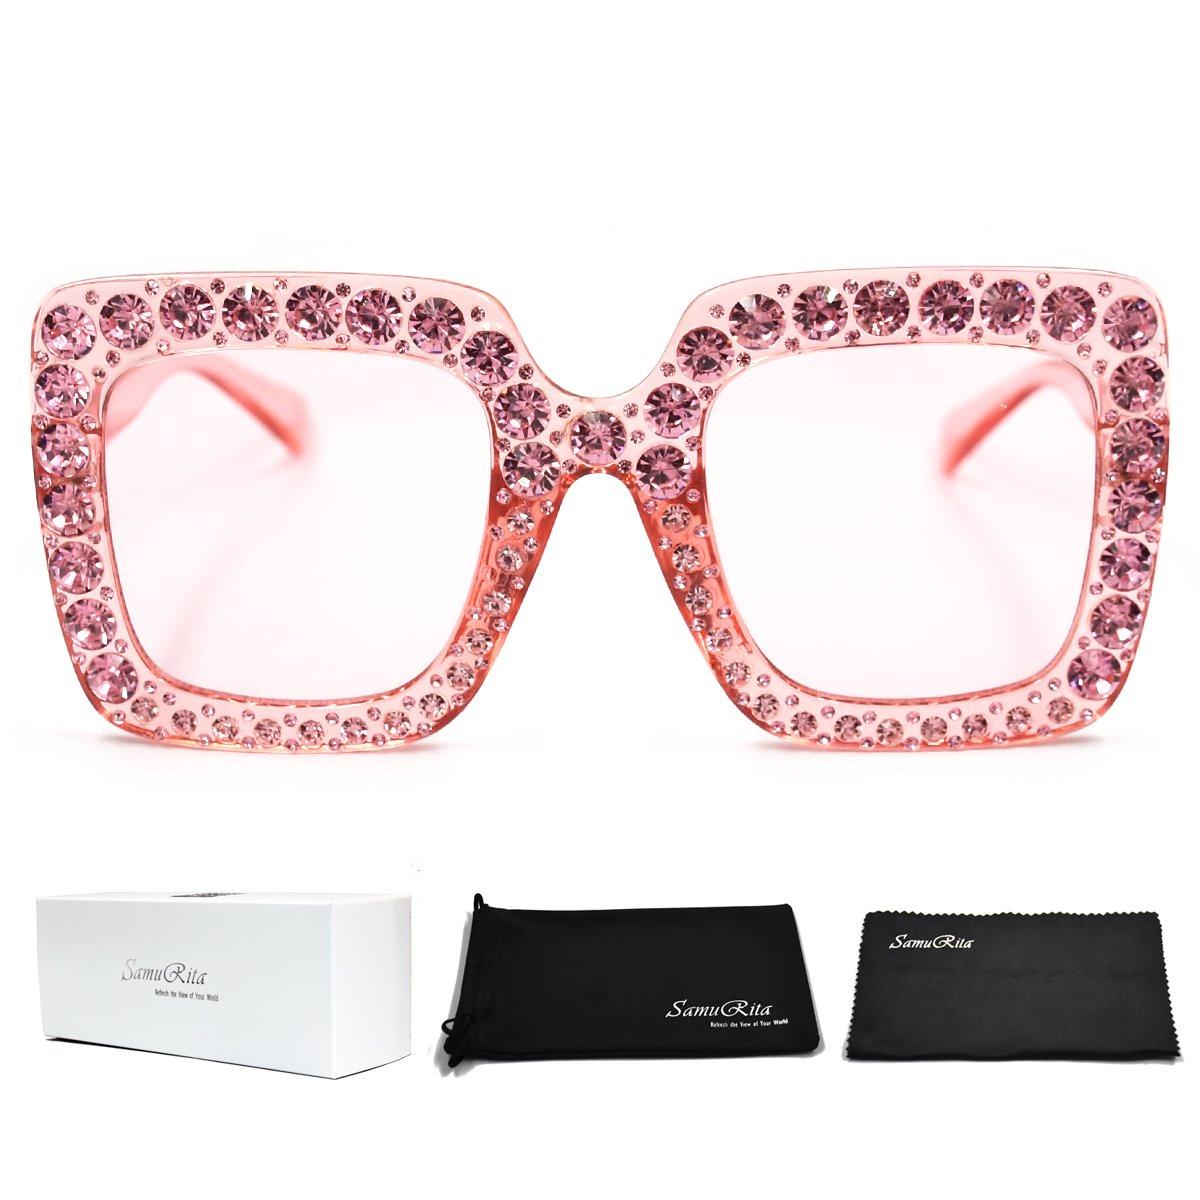 SamuRita Elton Square Diamond Rhinestone Sunglasses Novelty Oversized Celebrity Shades(Pink Frame/Pink Gradient Lens)